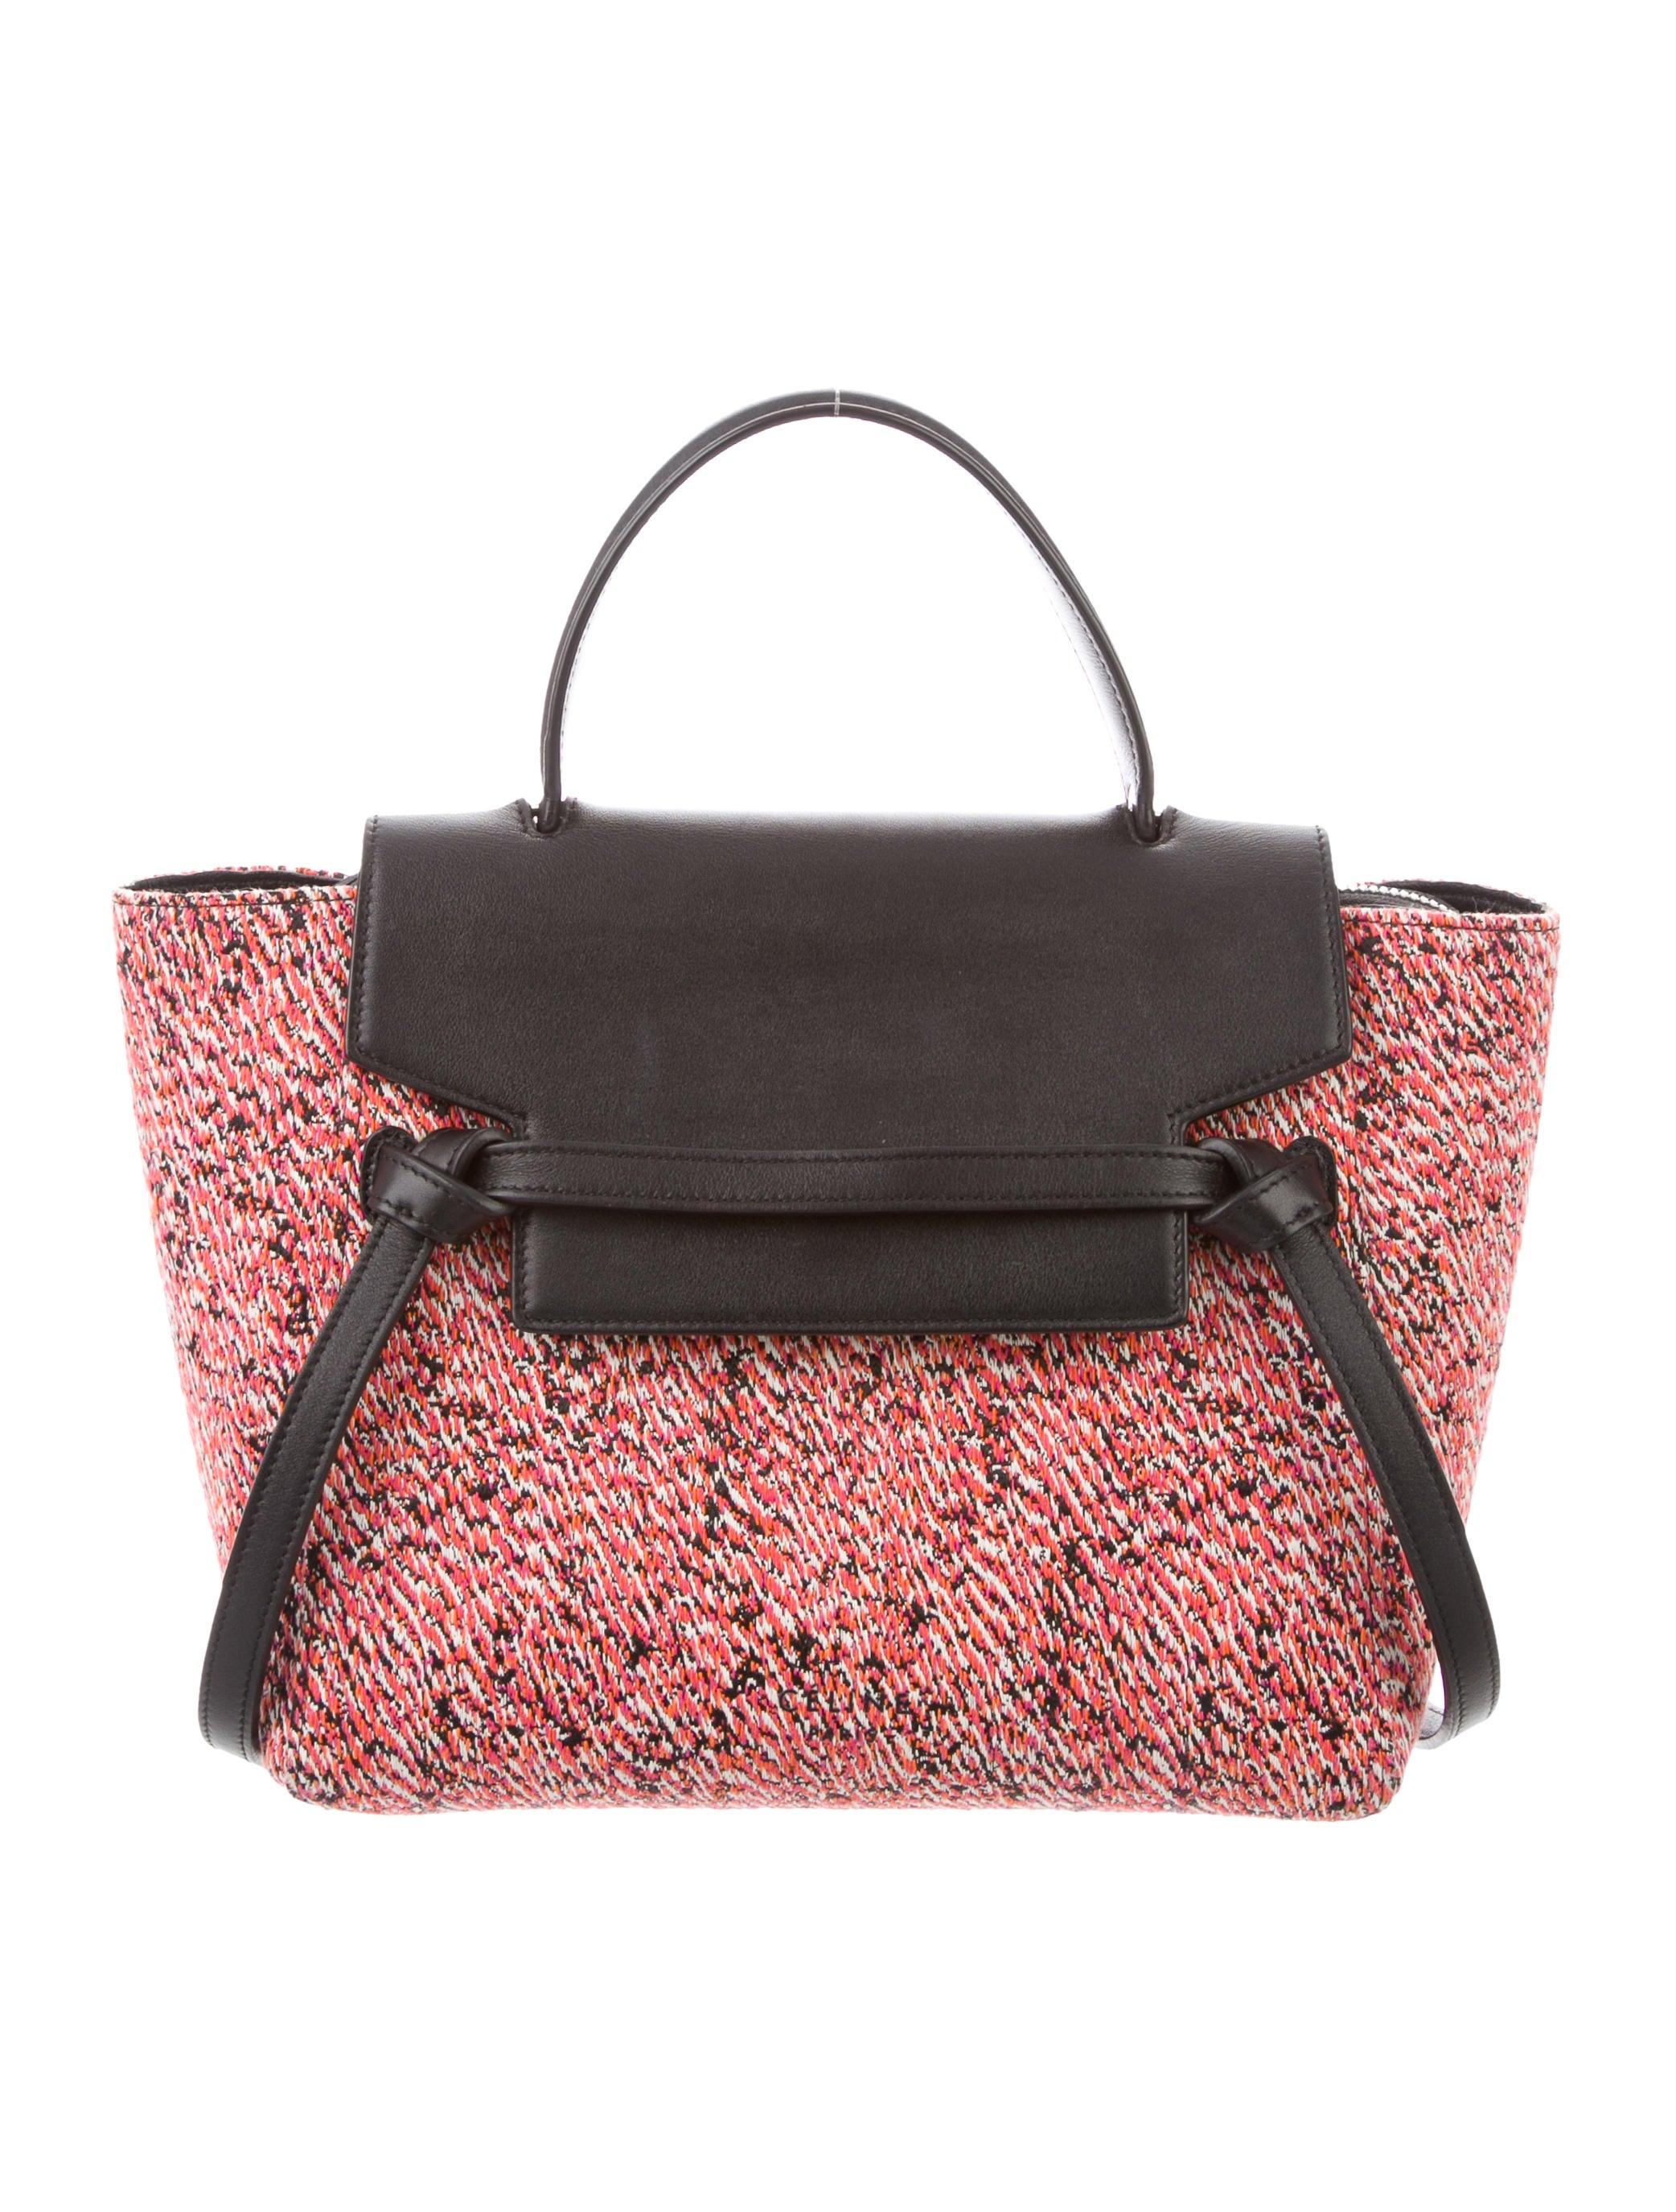 Celine Micro Fuzzy Jacquard Belt Bag Handbags Cel103160 The Realreal